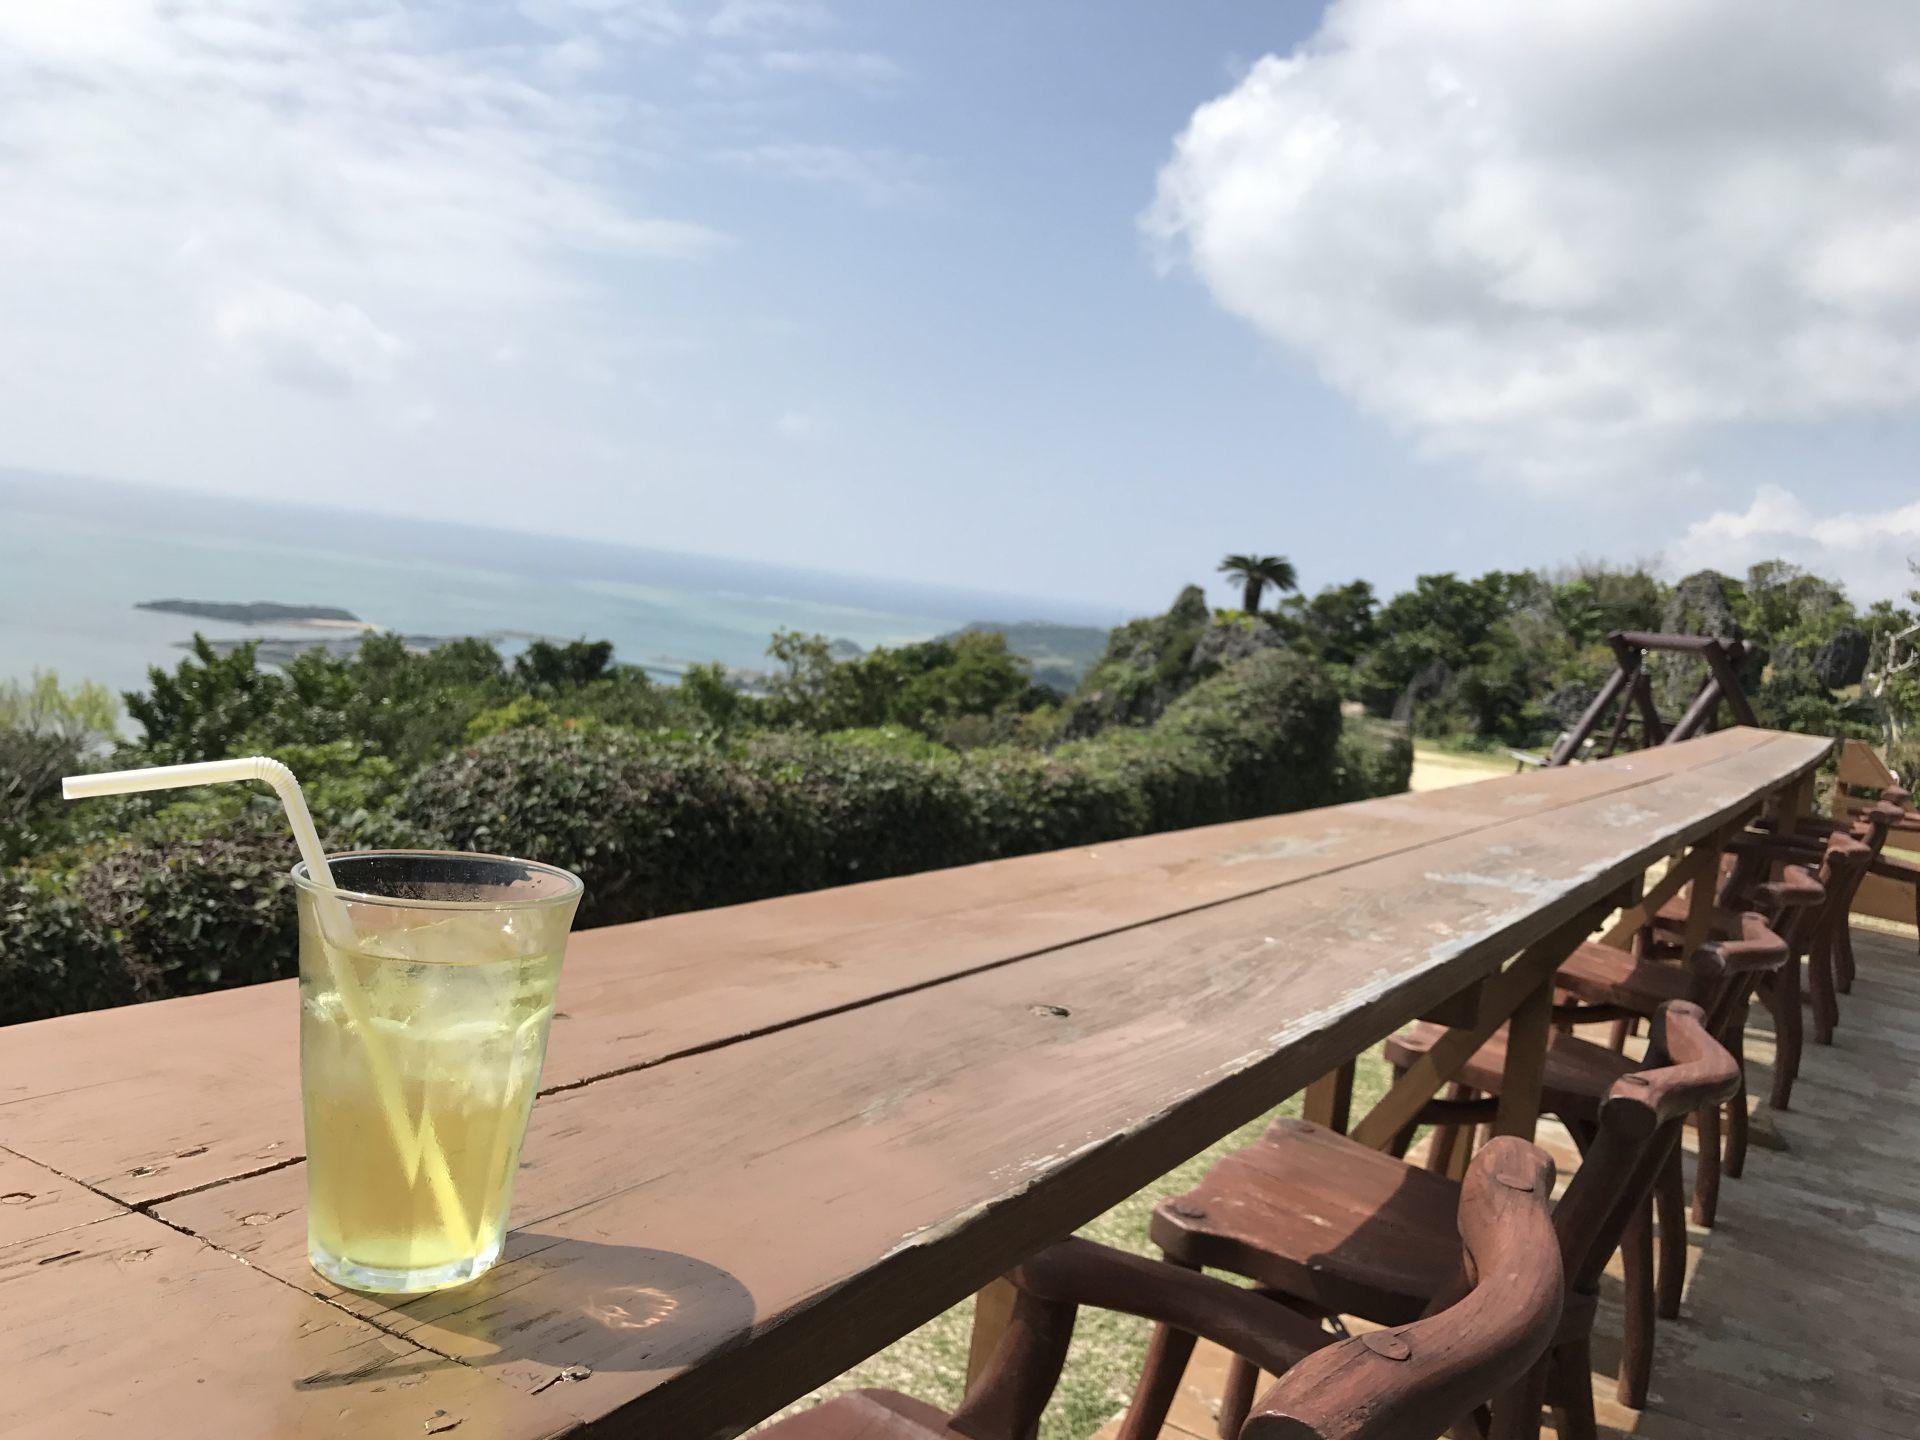 I can appreciate the seascape while drinking tea.